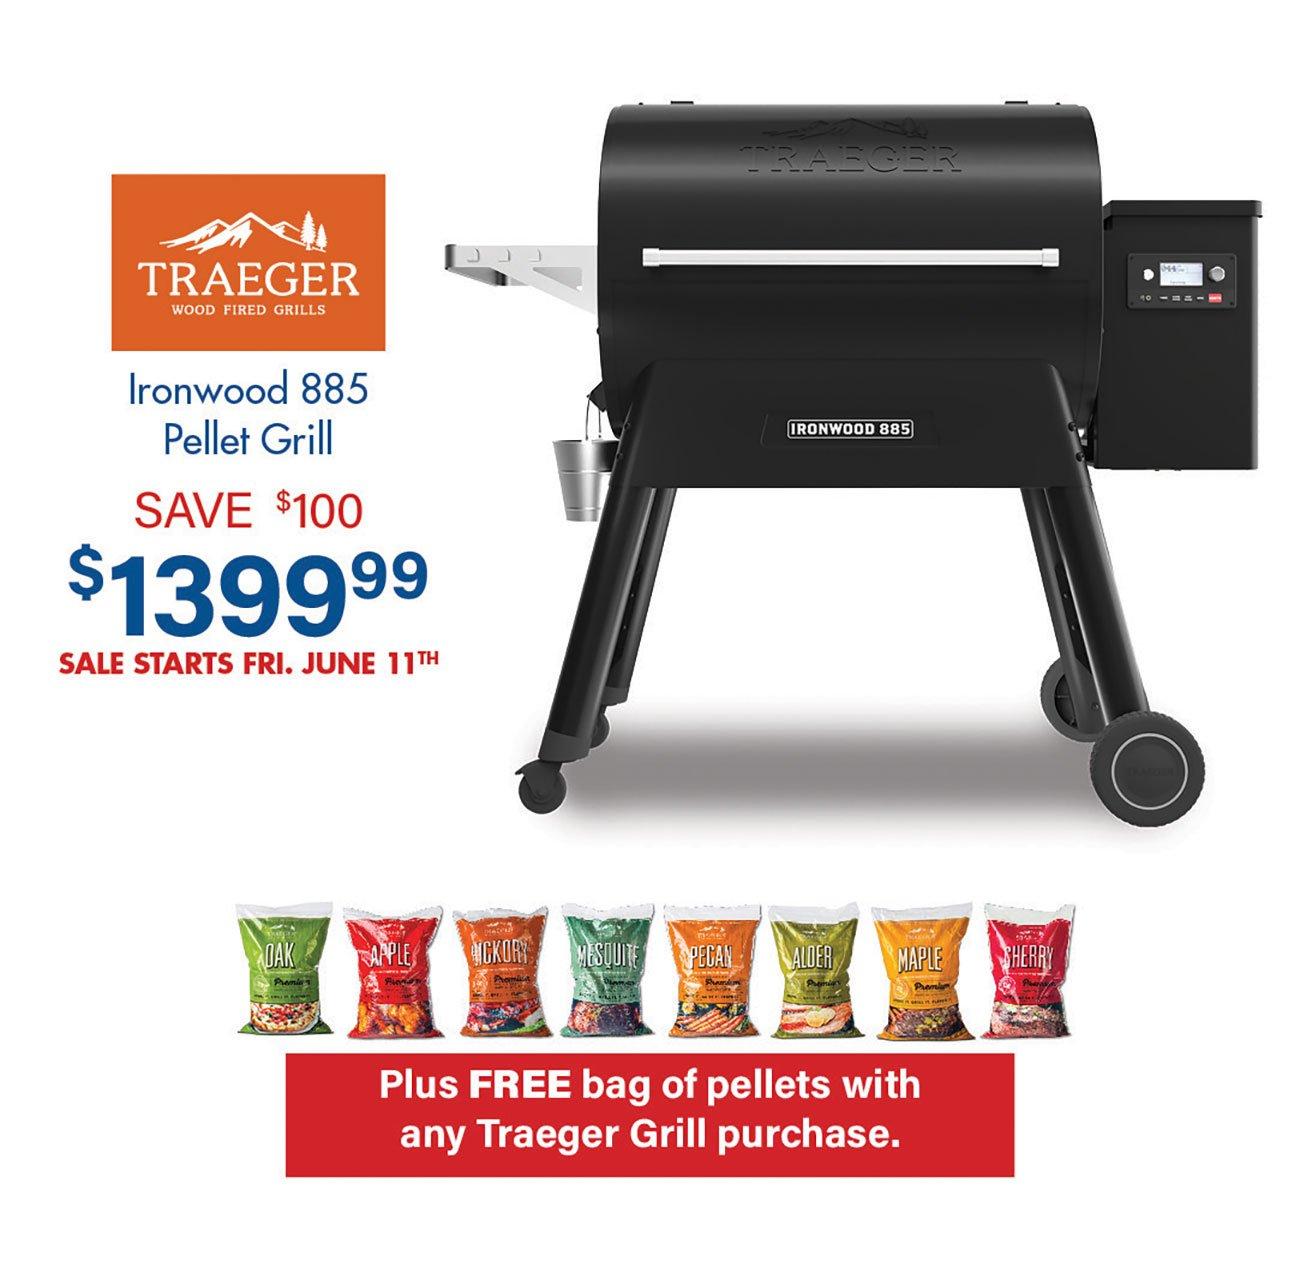 Traeger-Ironwood-885-Pellet-Grill-Black